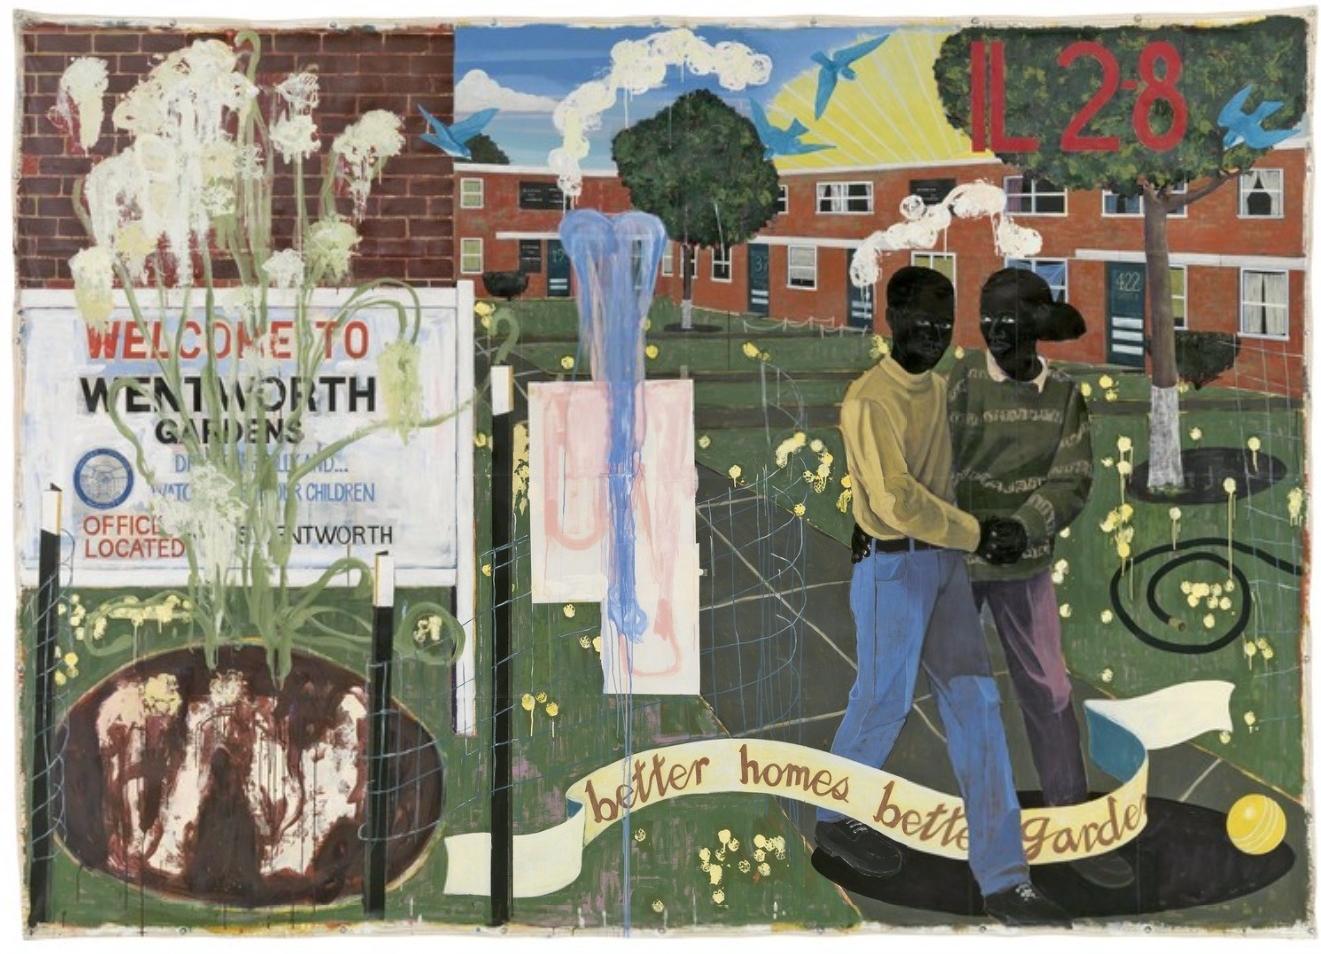 Better homes, better gardens, (Kerry James Marshall - Mastry), MCA Chicago